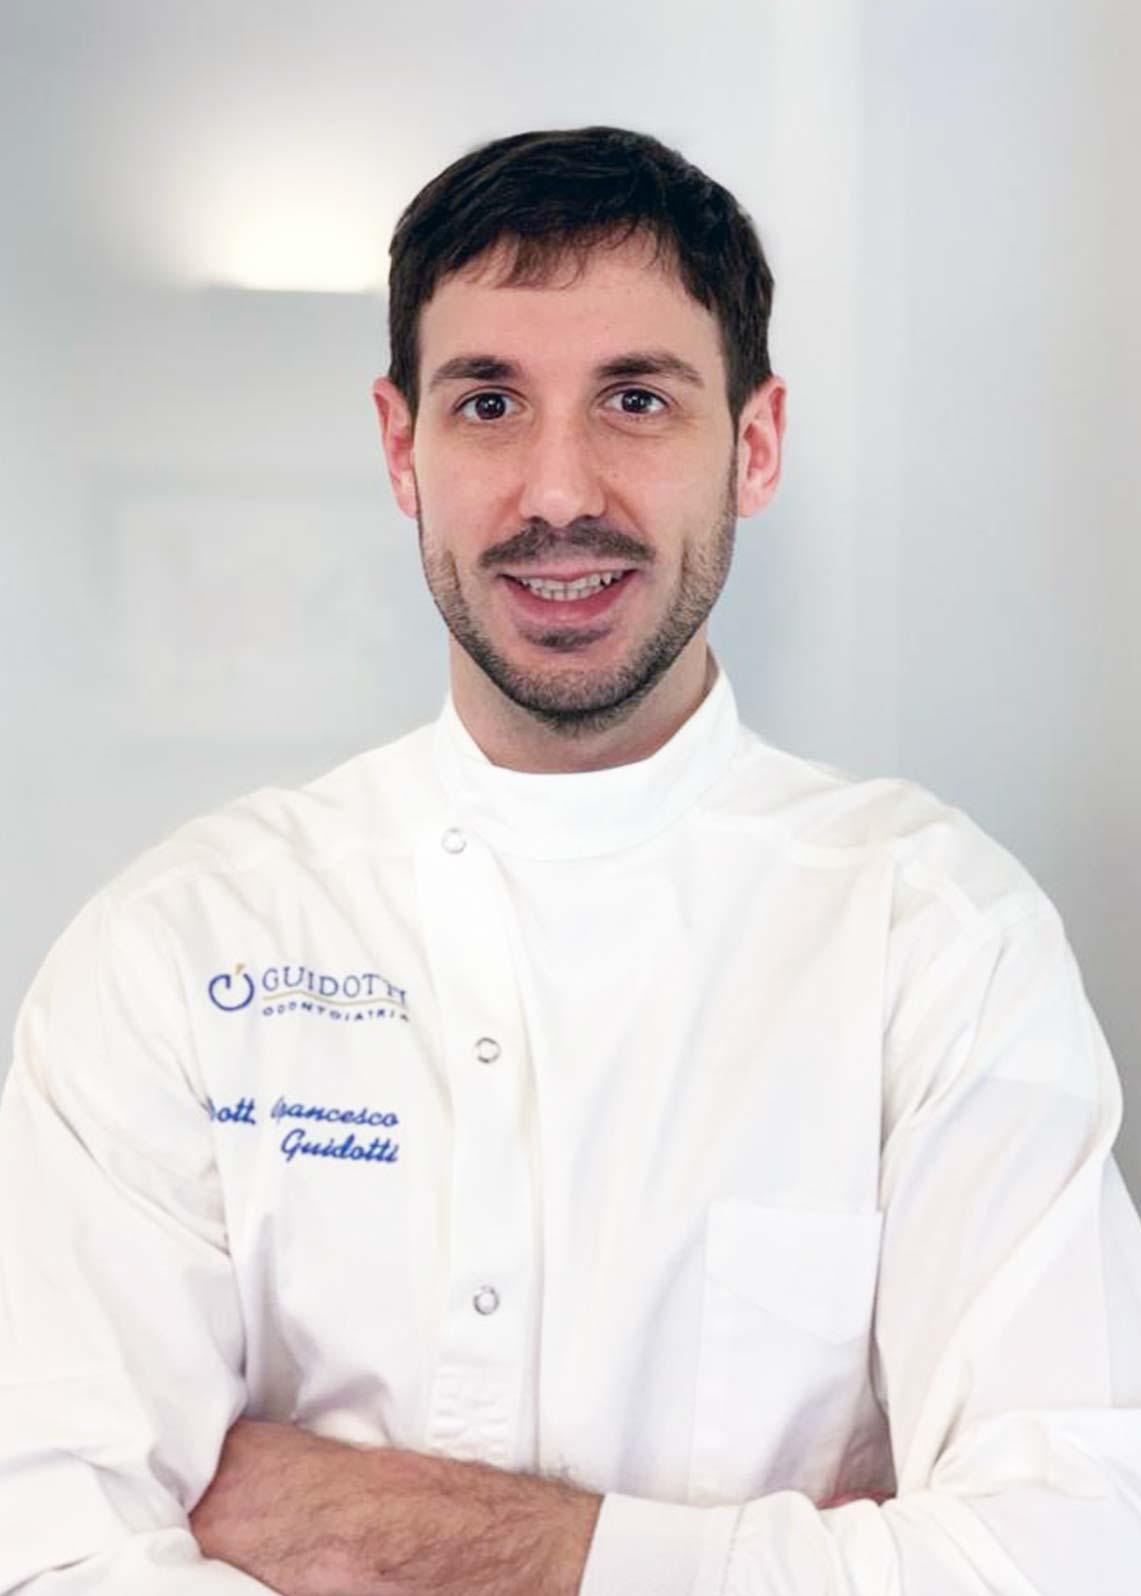 Guidotti Odontoiatria dott_francesco_guidotti